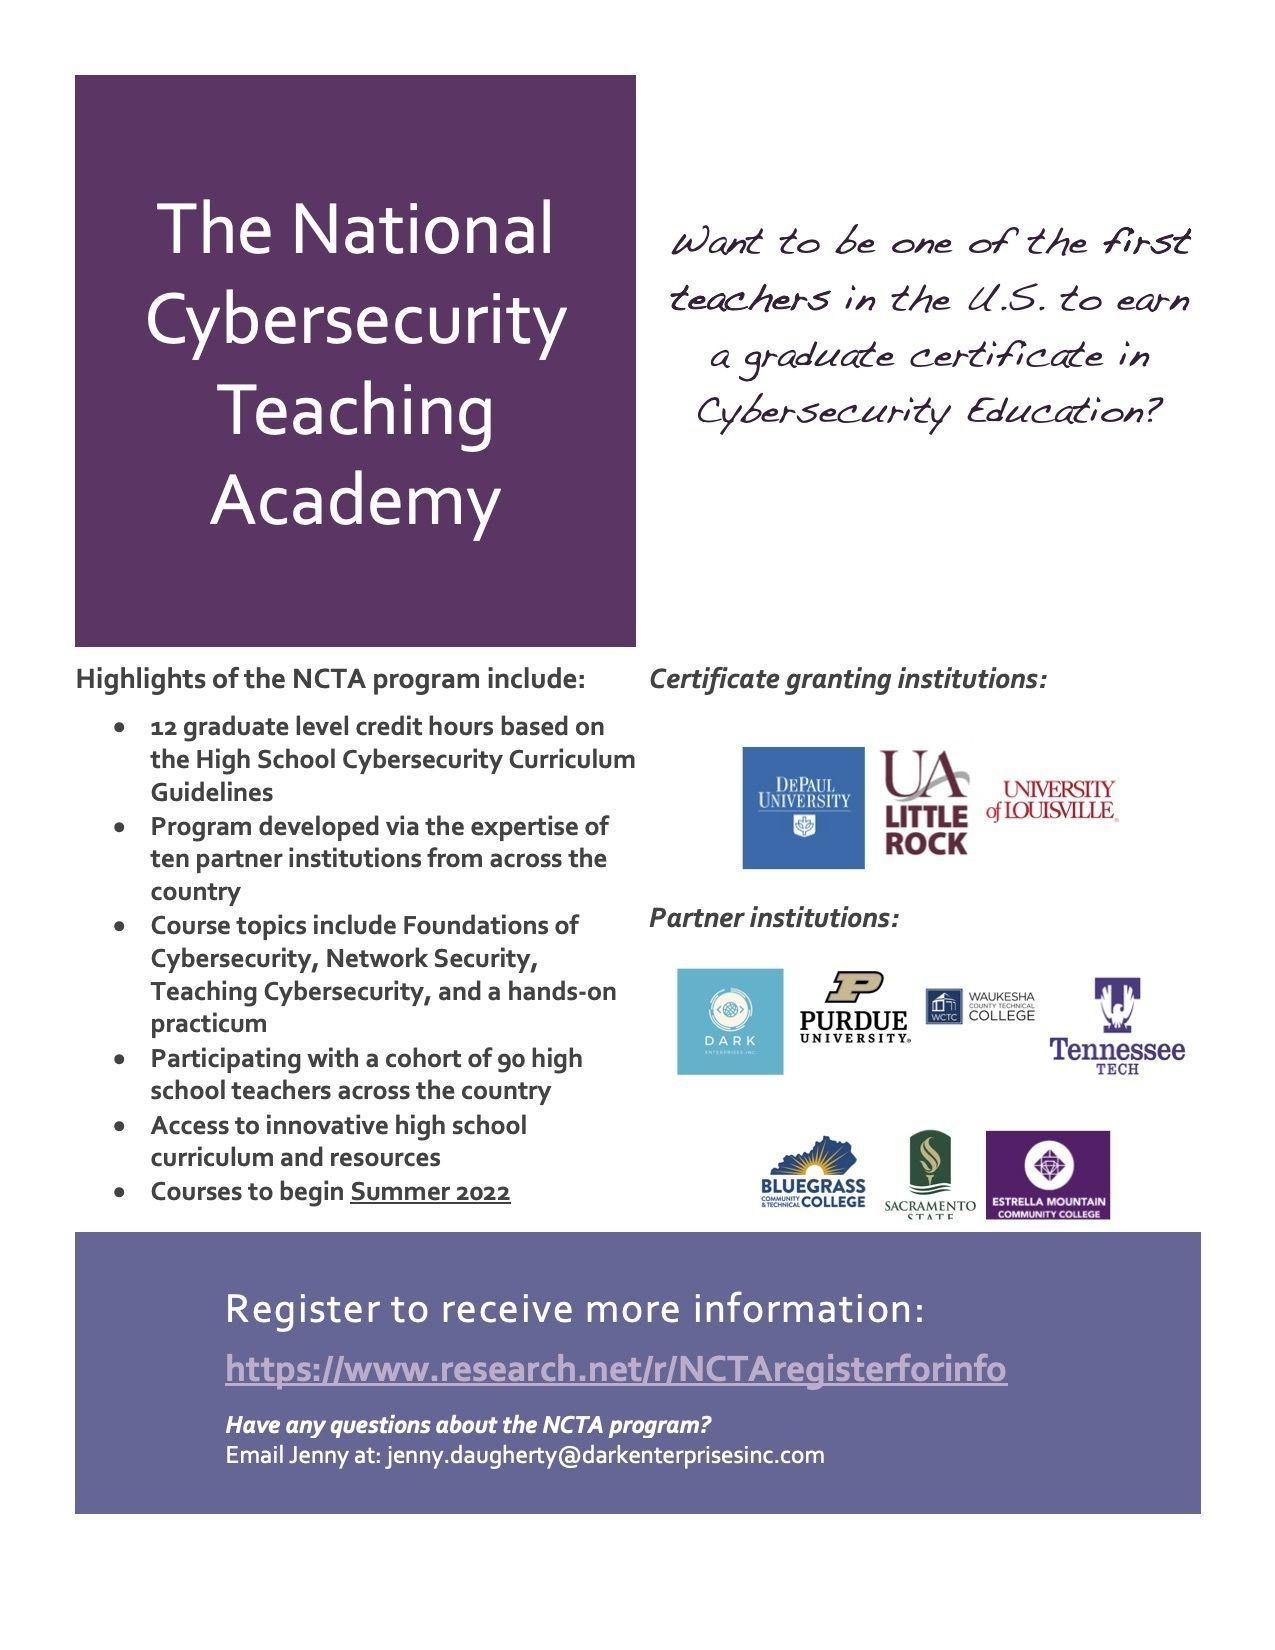 National Cybersecurity Teaching Academy for High School Teachers